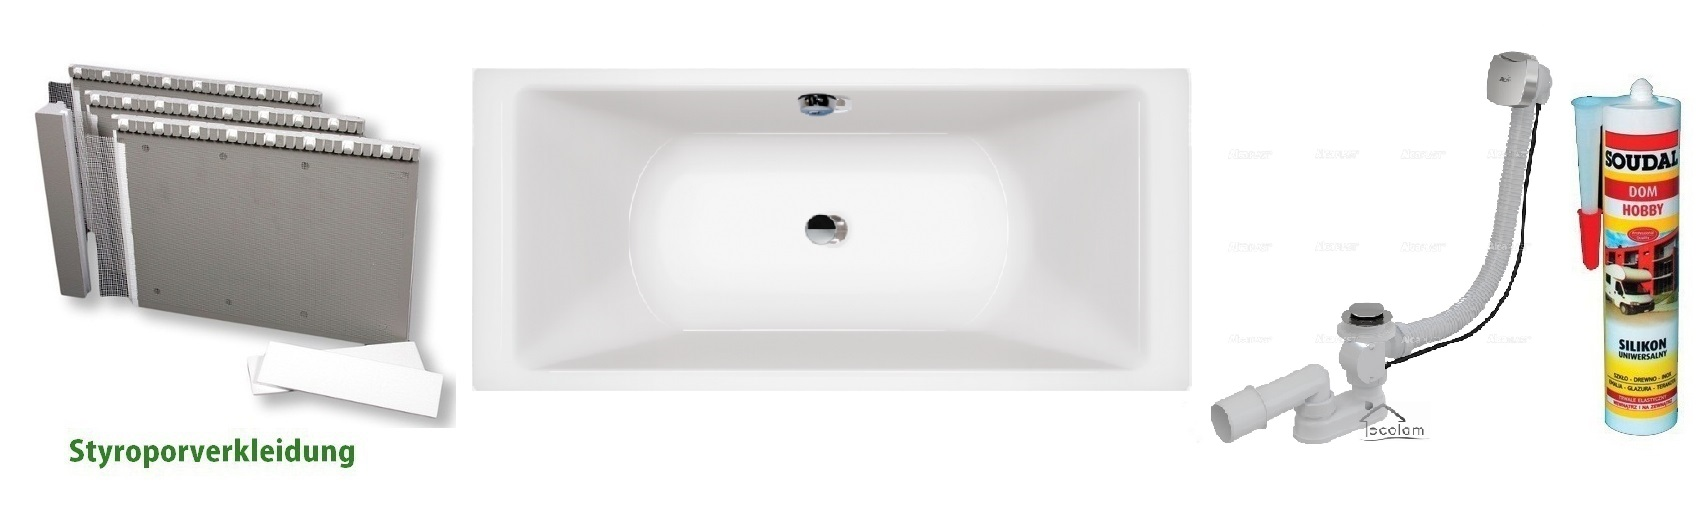 badewanne wanne rechteck 200 x 90 cm f e ablauf silikon. Black Bedroom Furniture Sets. Home Design Ideas